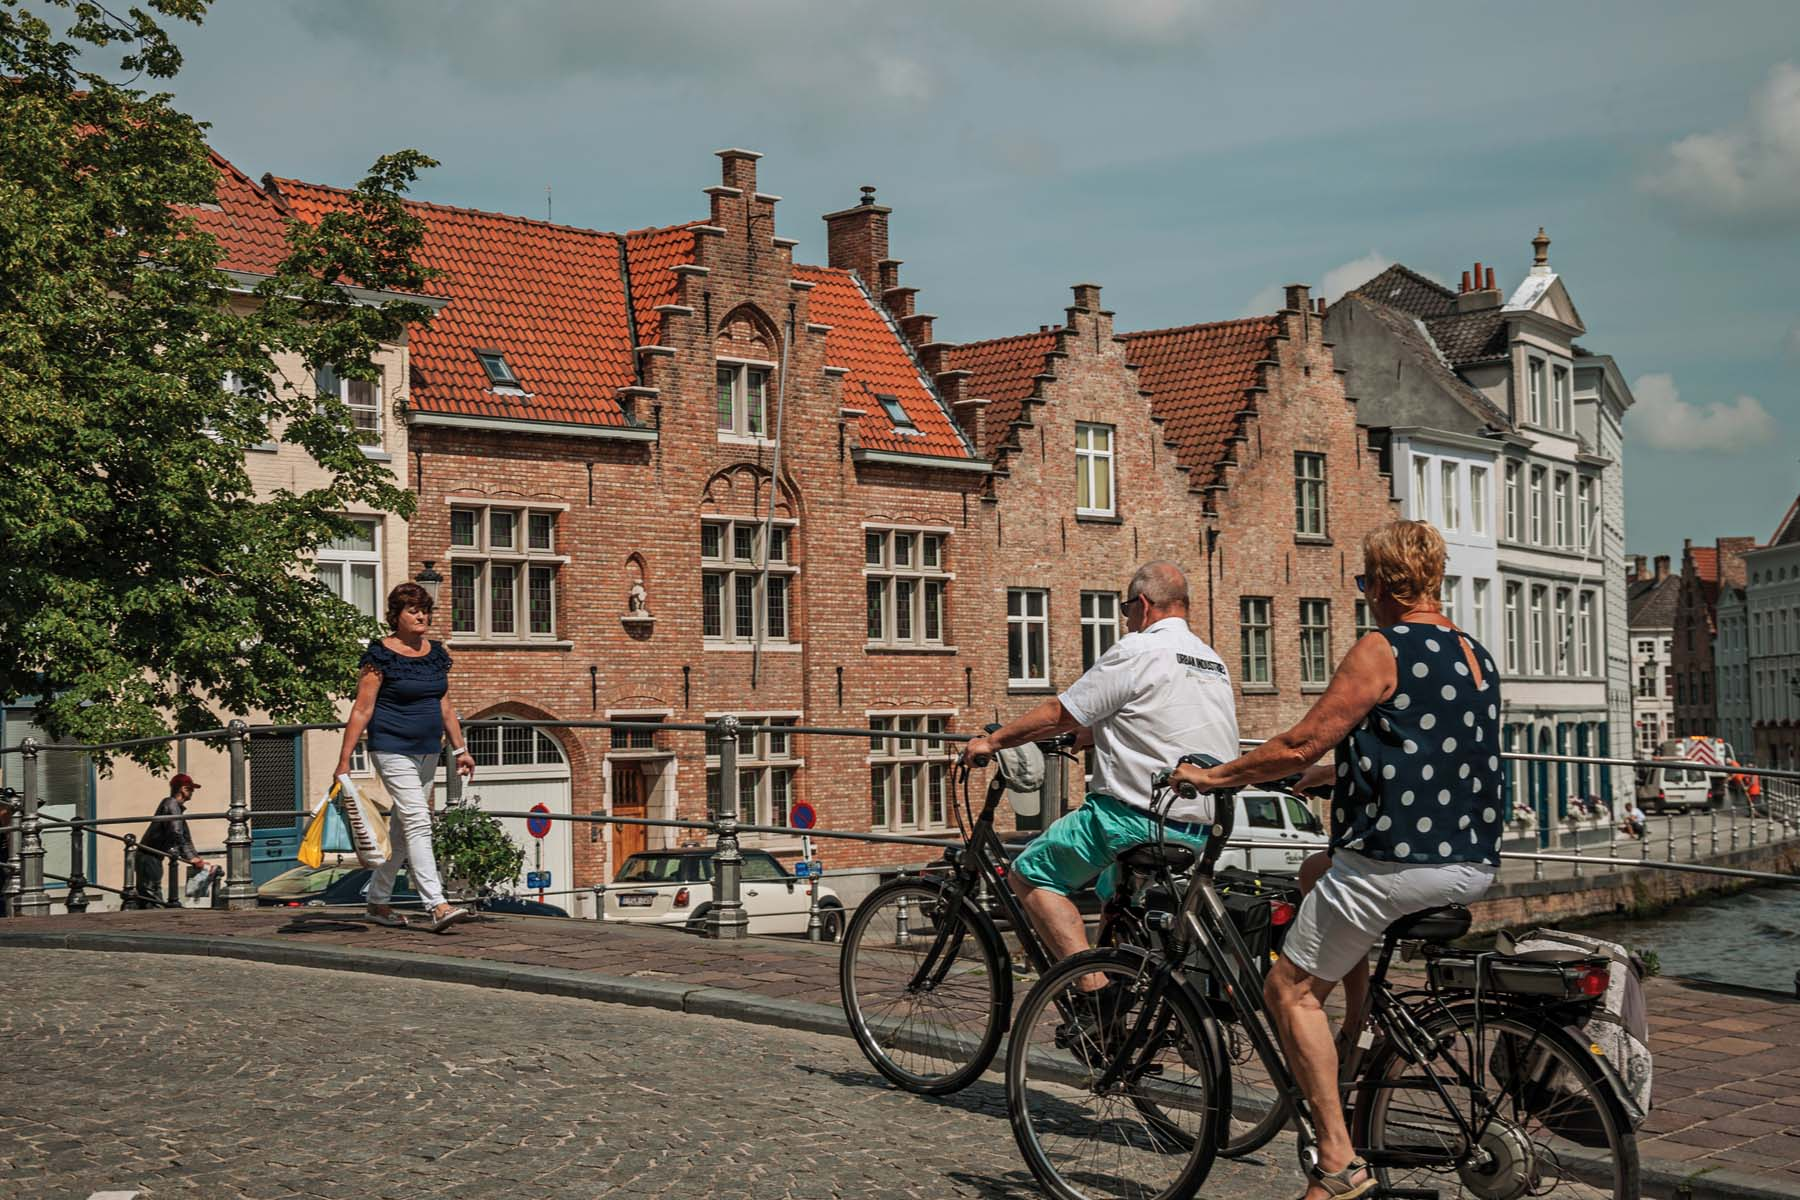 cyclists in Belgium